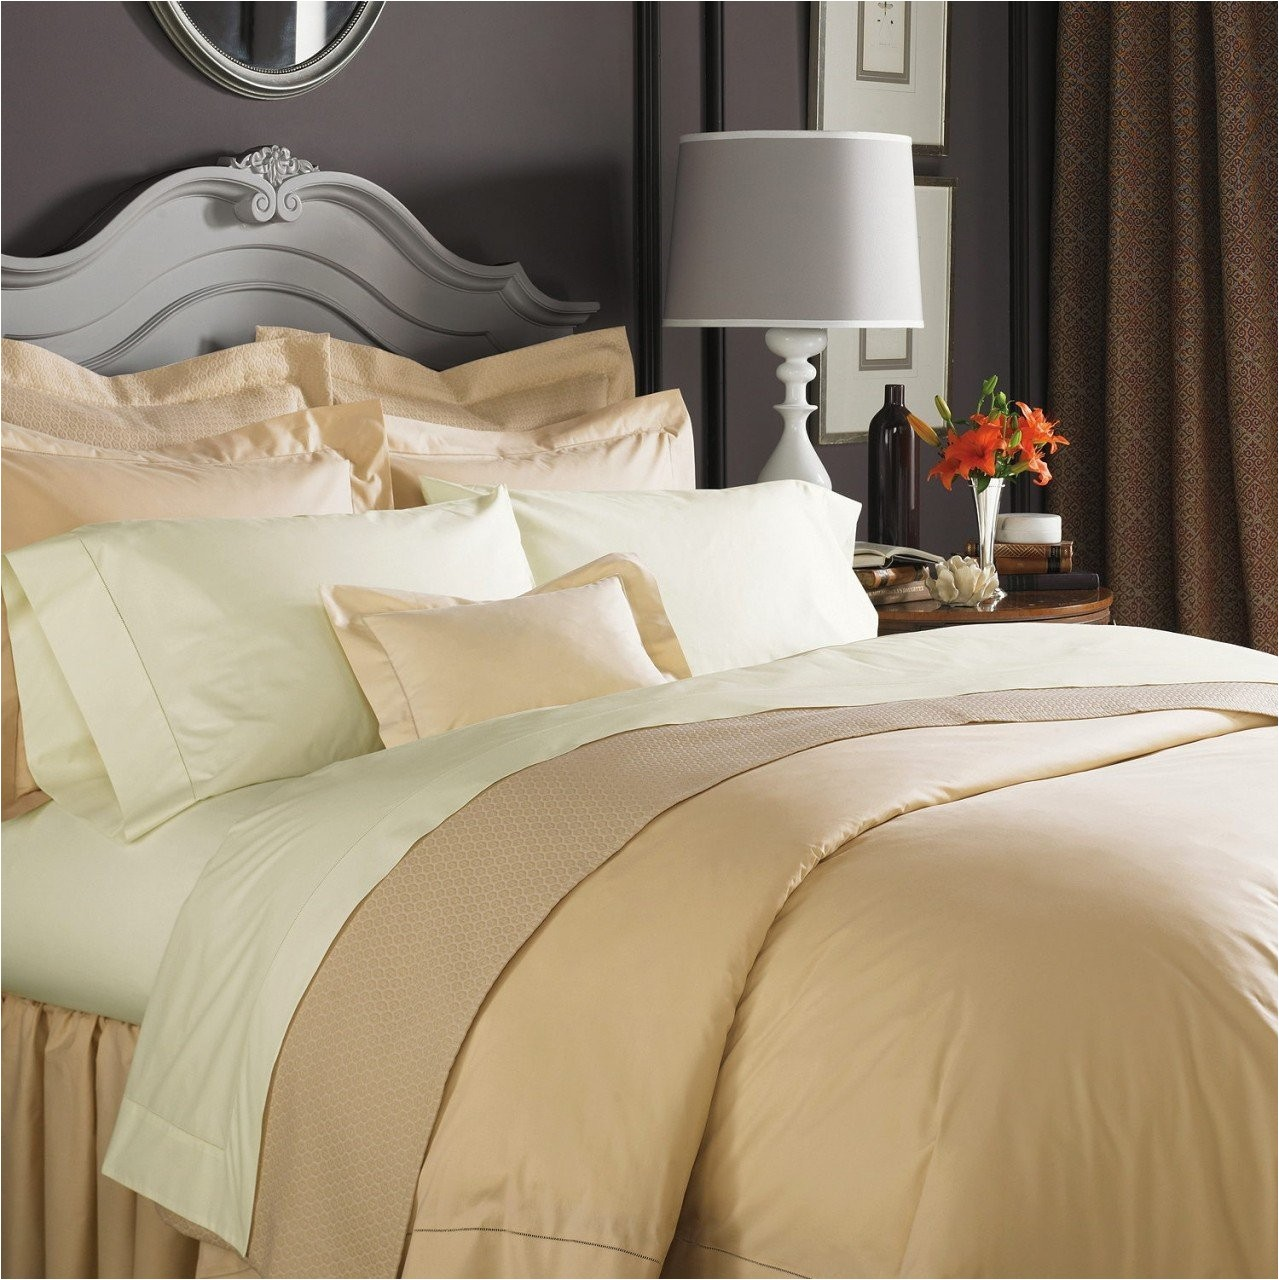 amazon com celeste linens by sferra king flat sheet ivory home kitchen